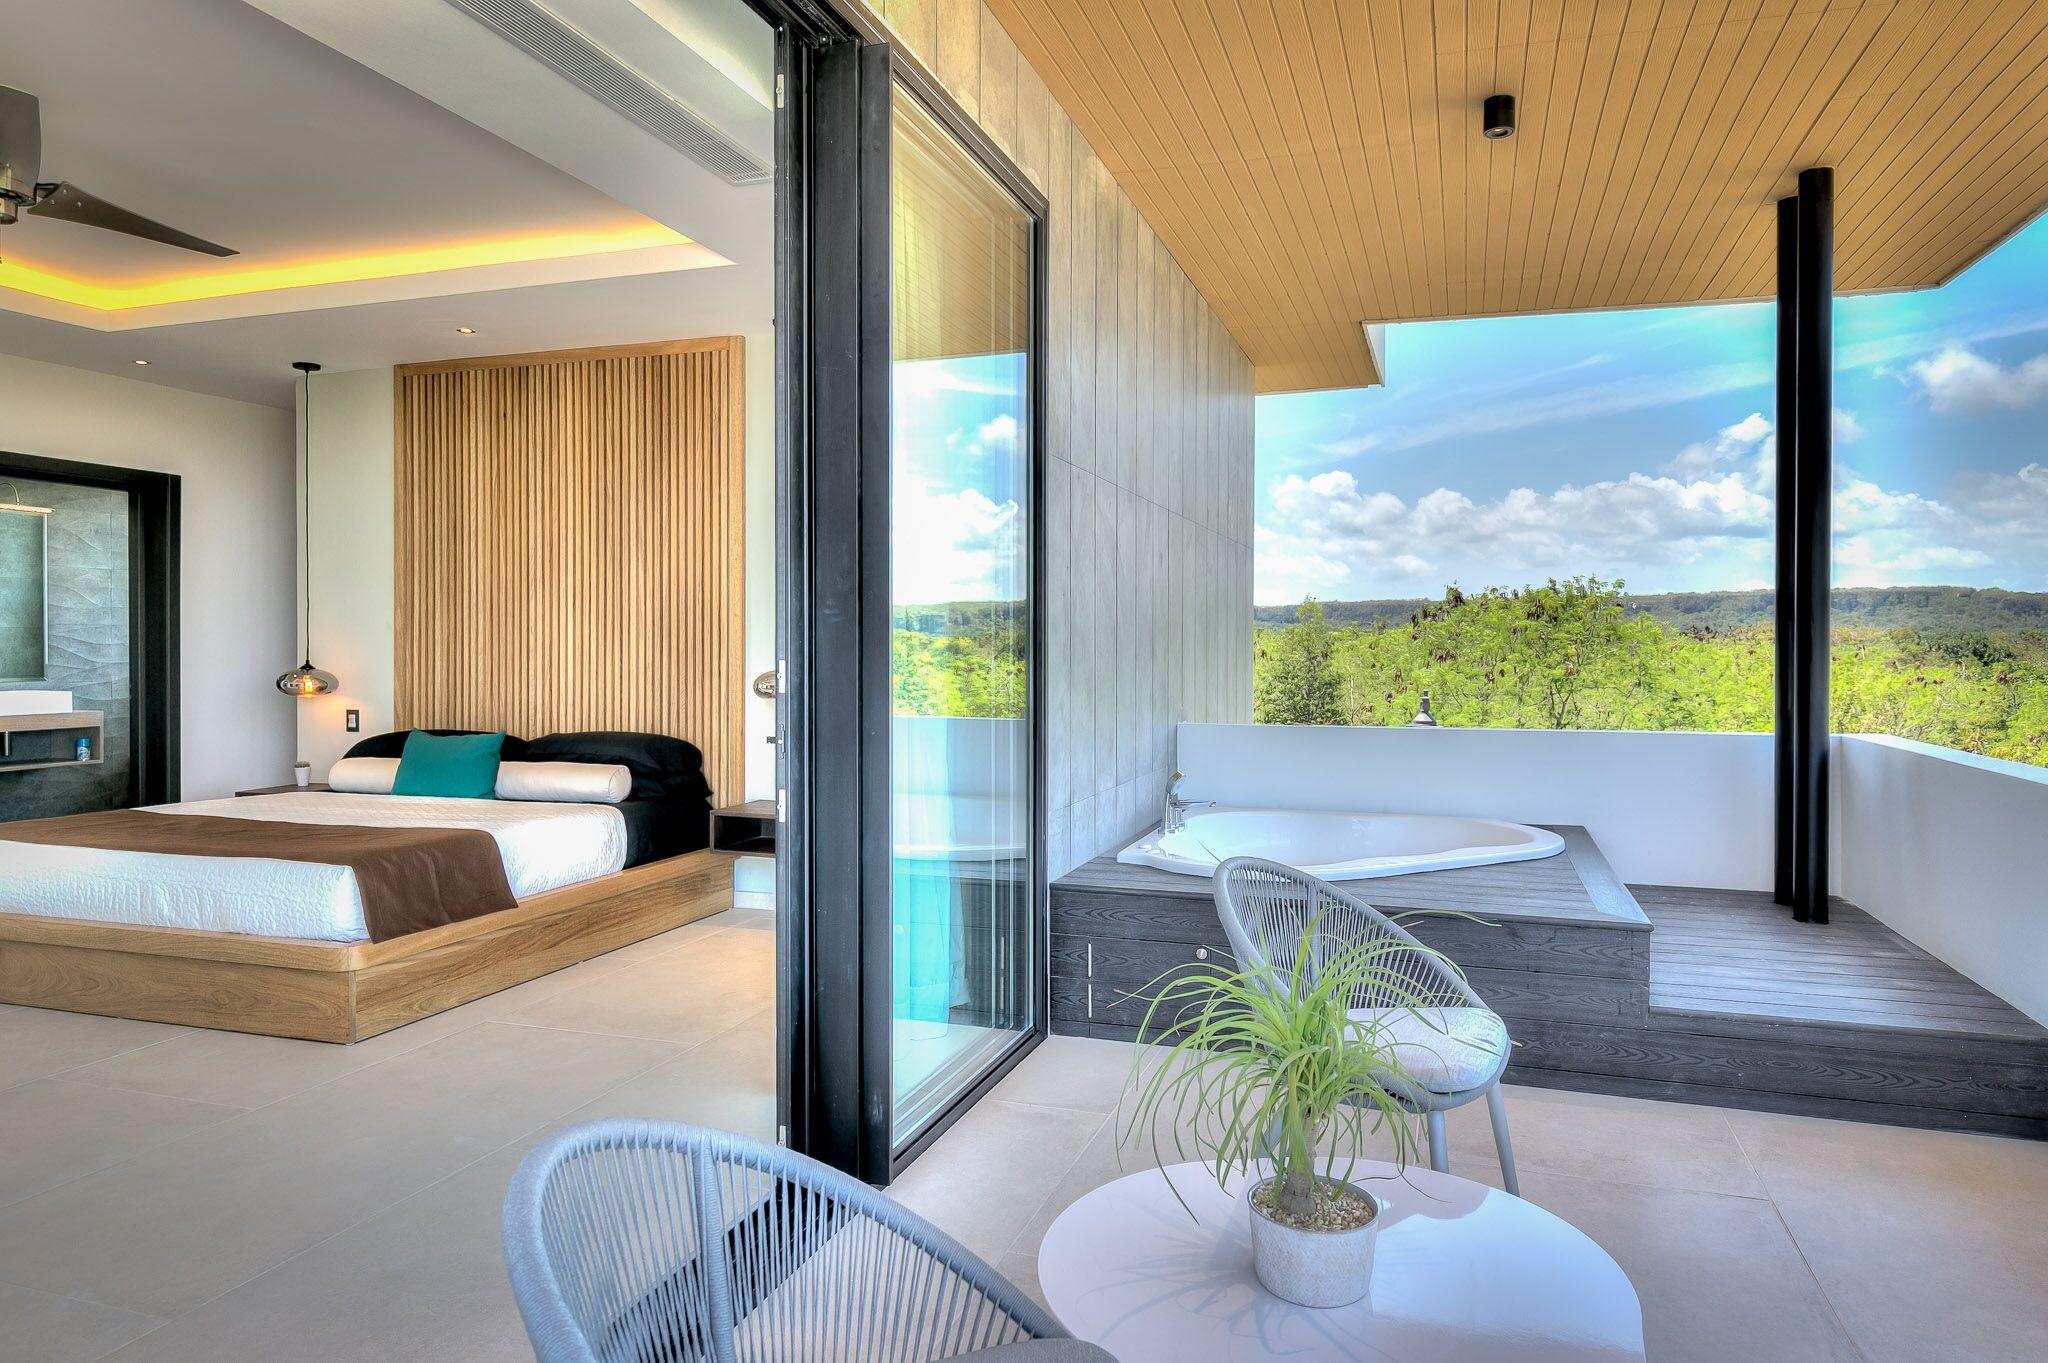 Balcony with a tub